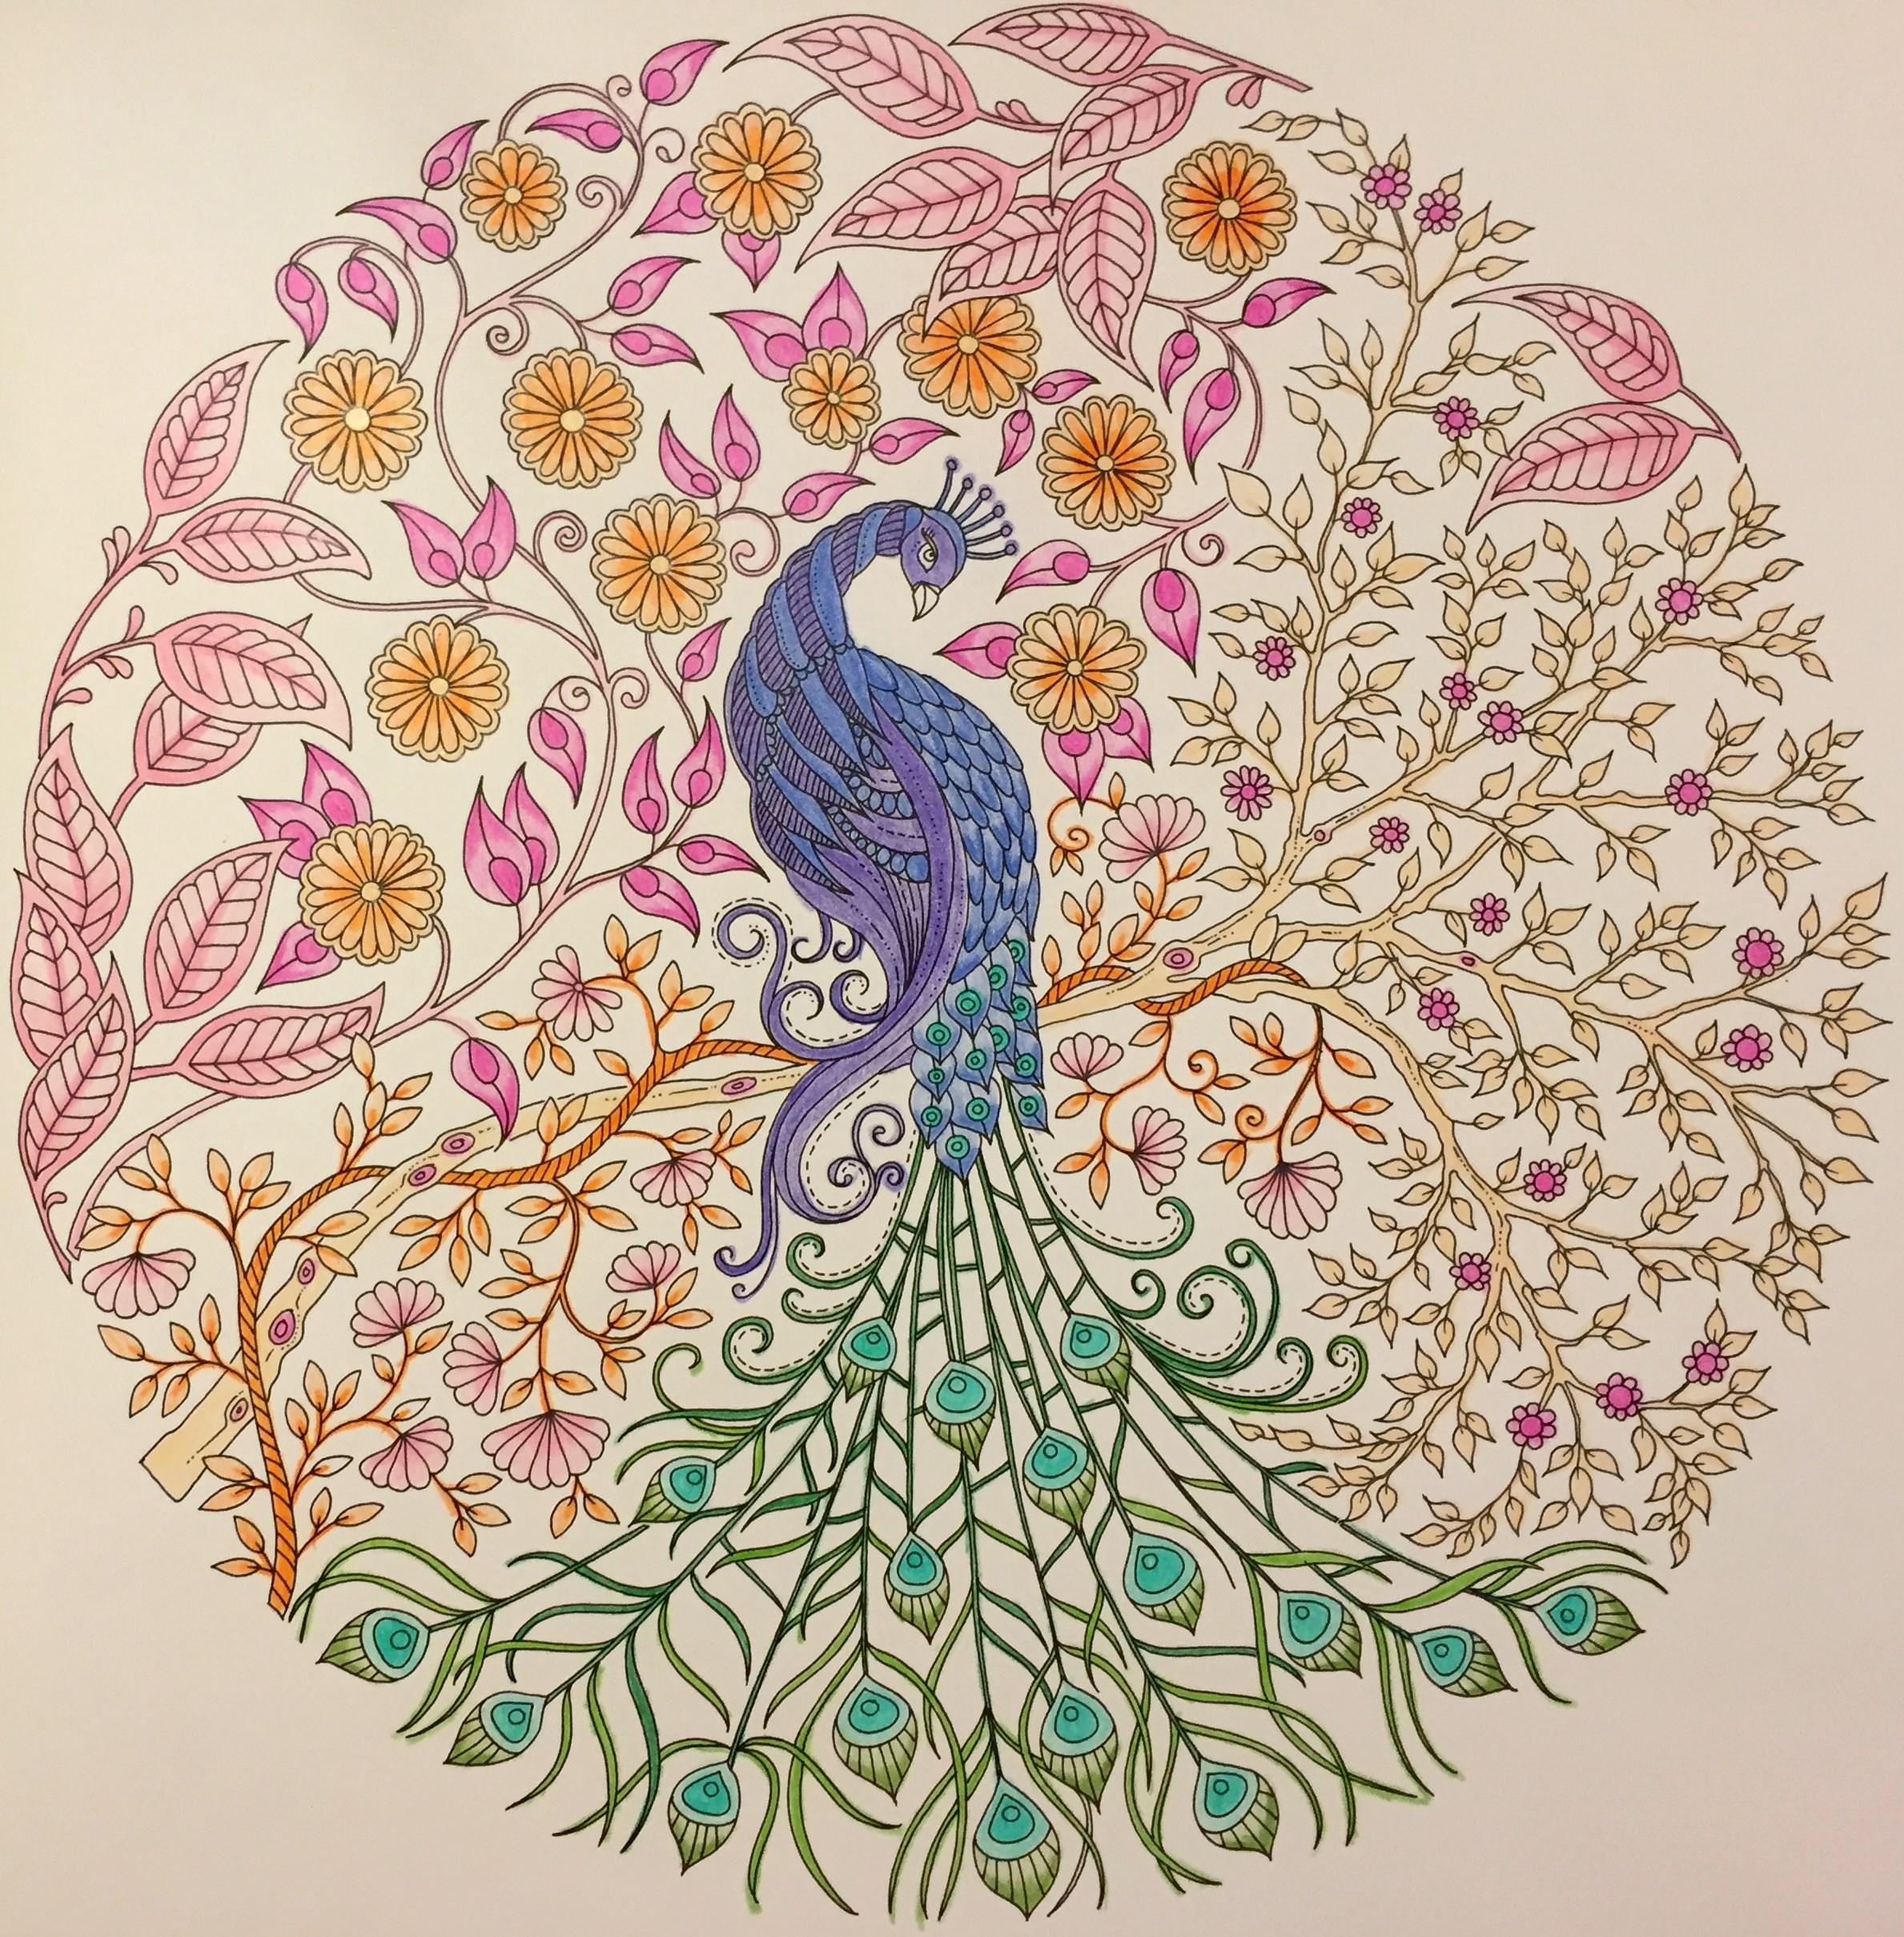 My Peacock Done With Crayola Coloured Pencils From Johanna Basfords Secret Garden Book